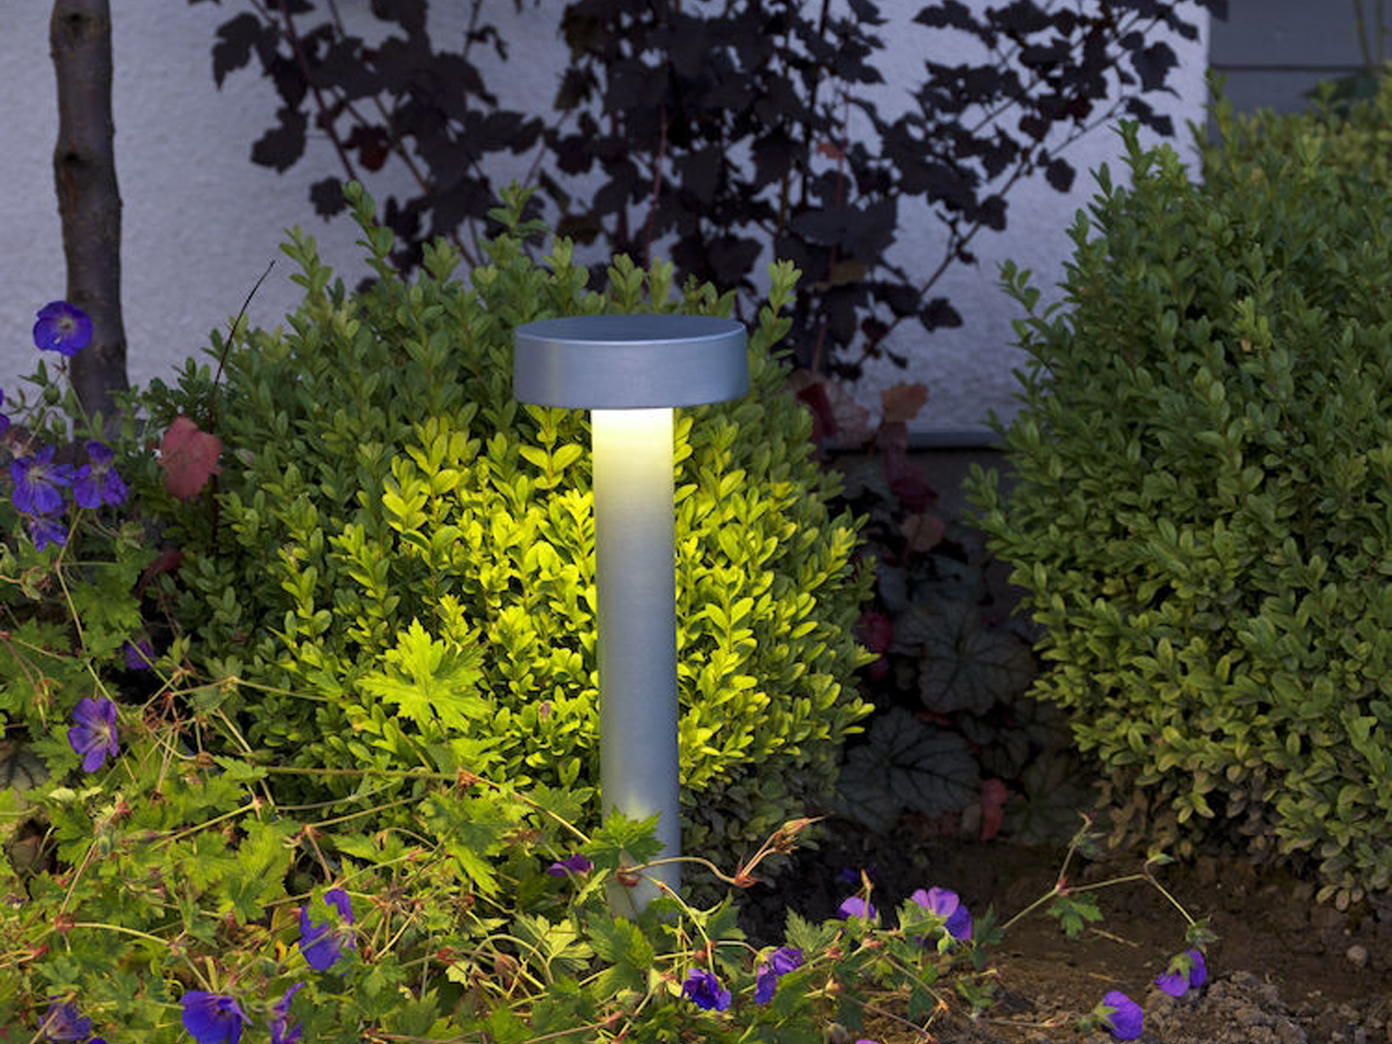 Extrem LED Wegeleuchte Sockelleuchte PESARO 50cm, Beleuchtung Garten YY06